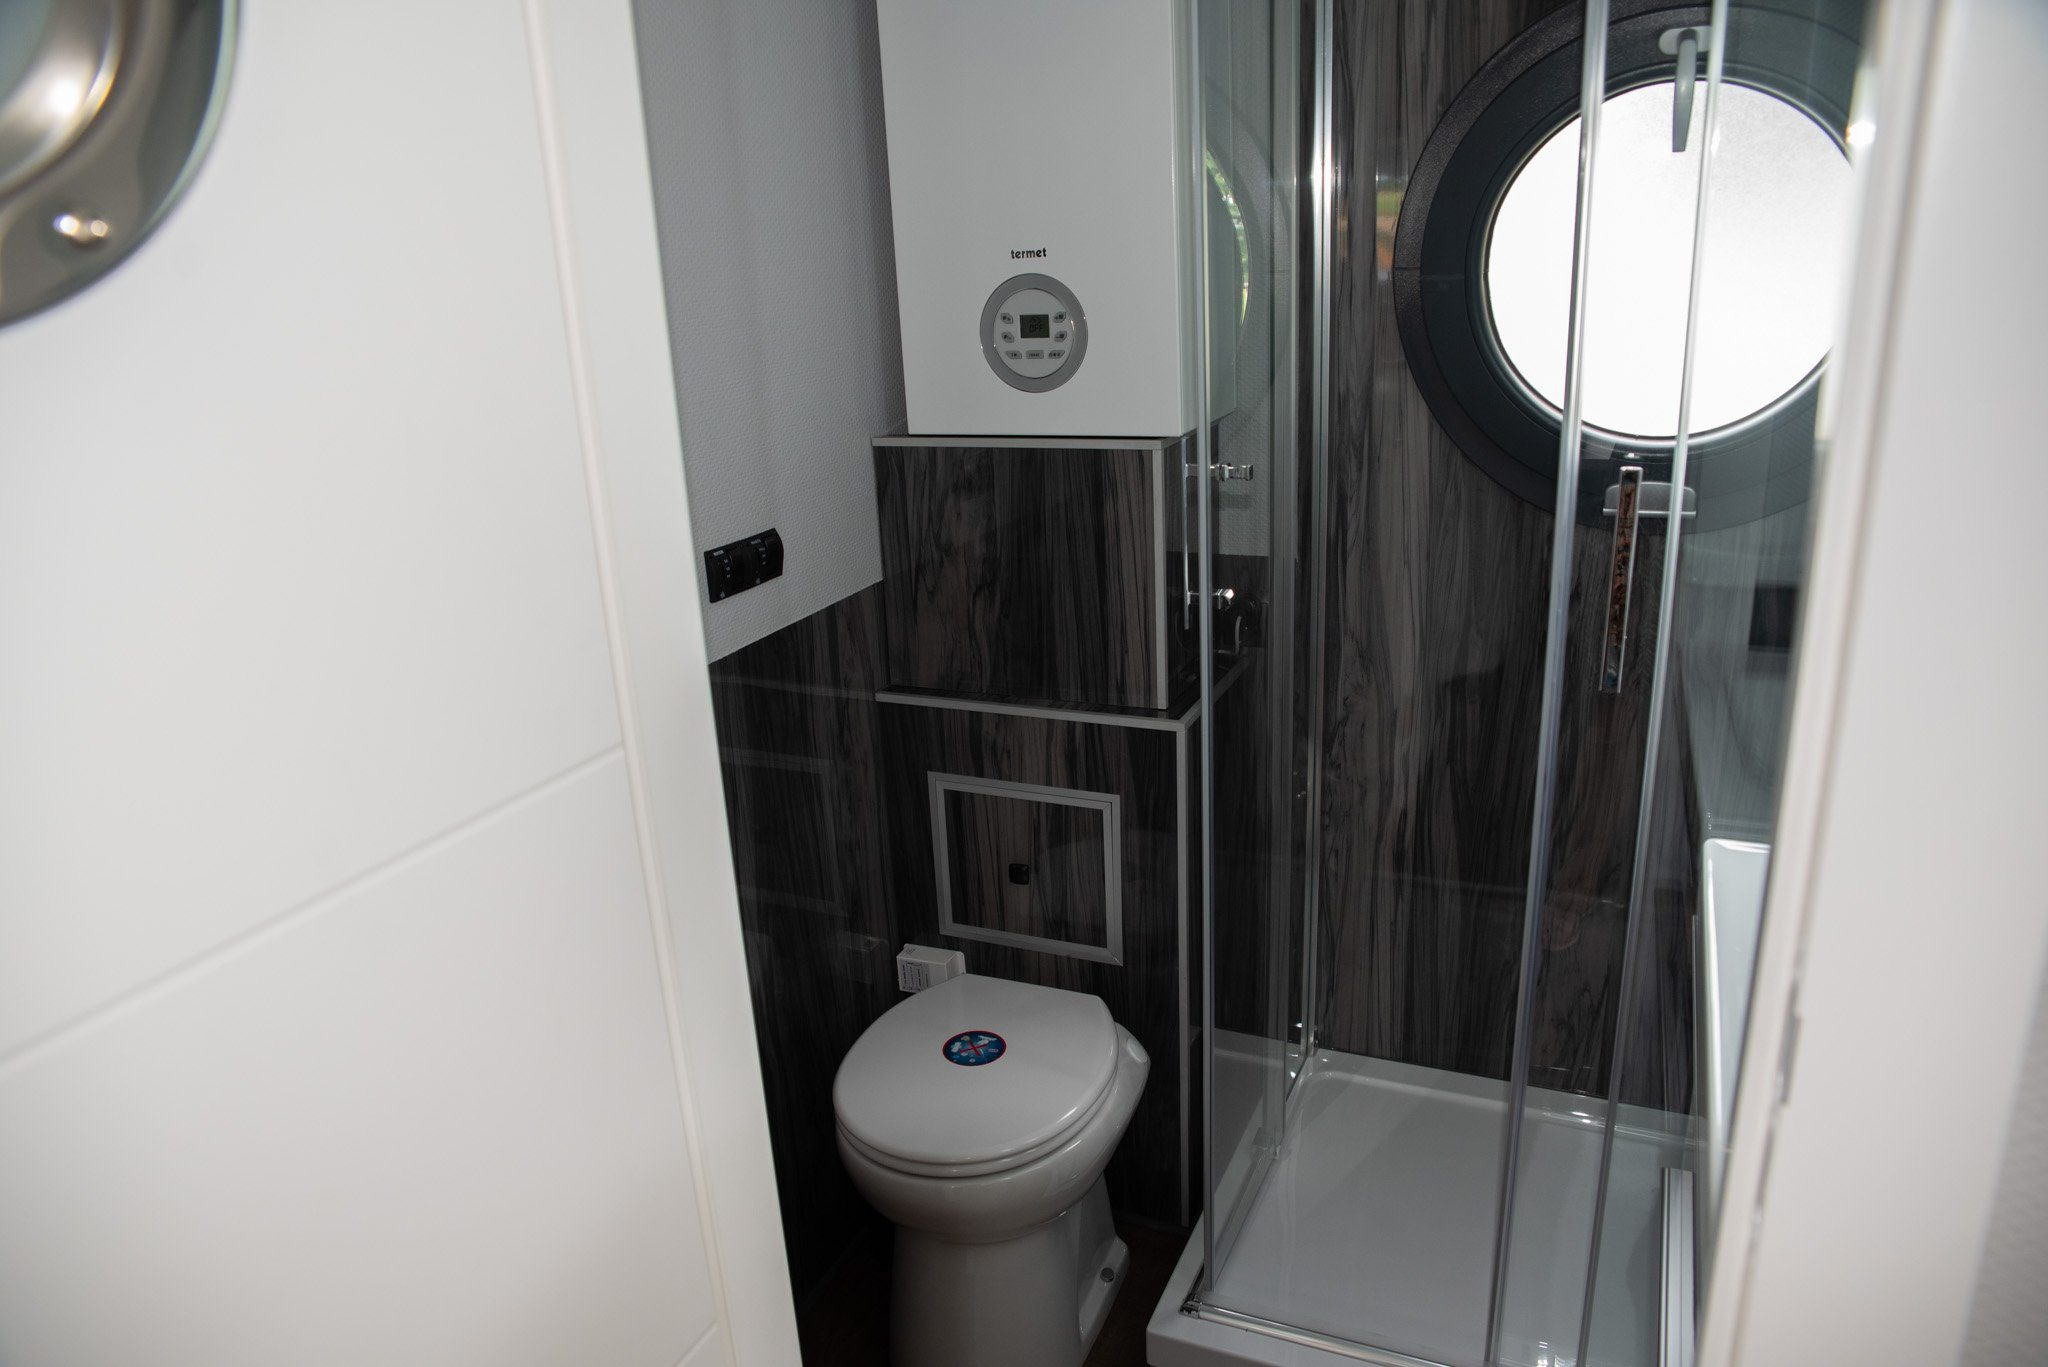 Apartboat l wc